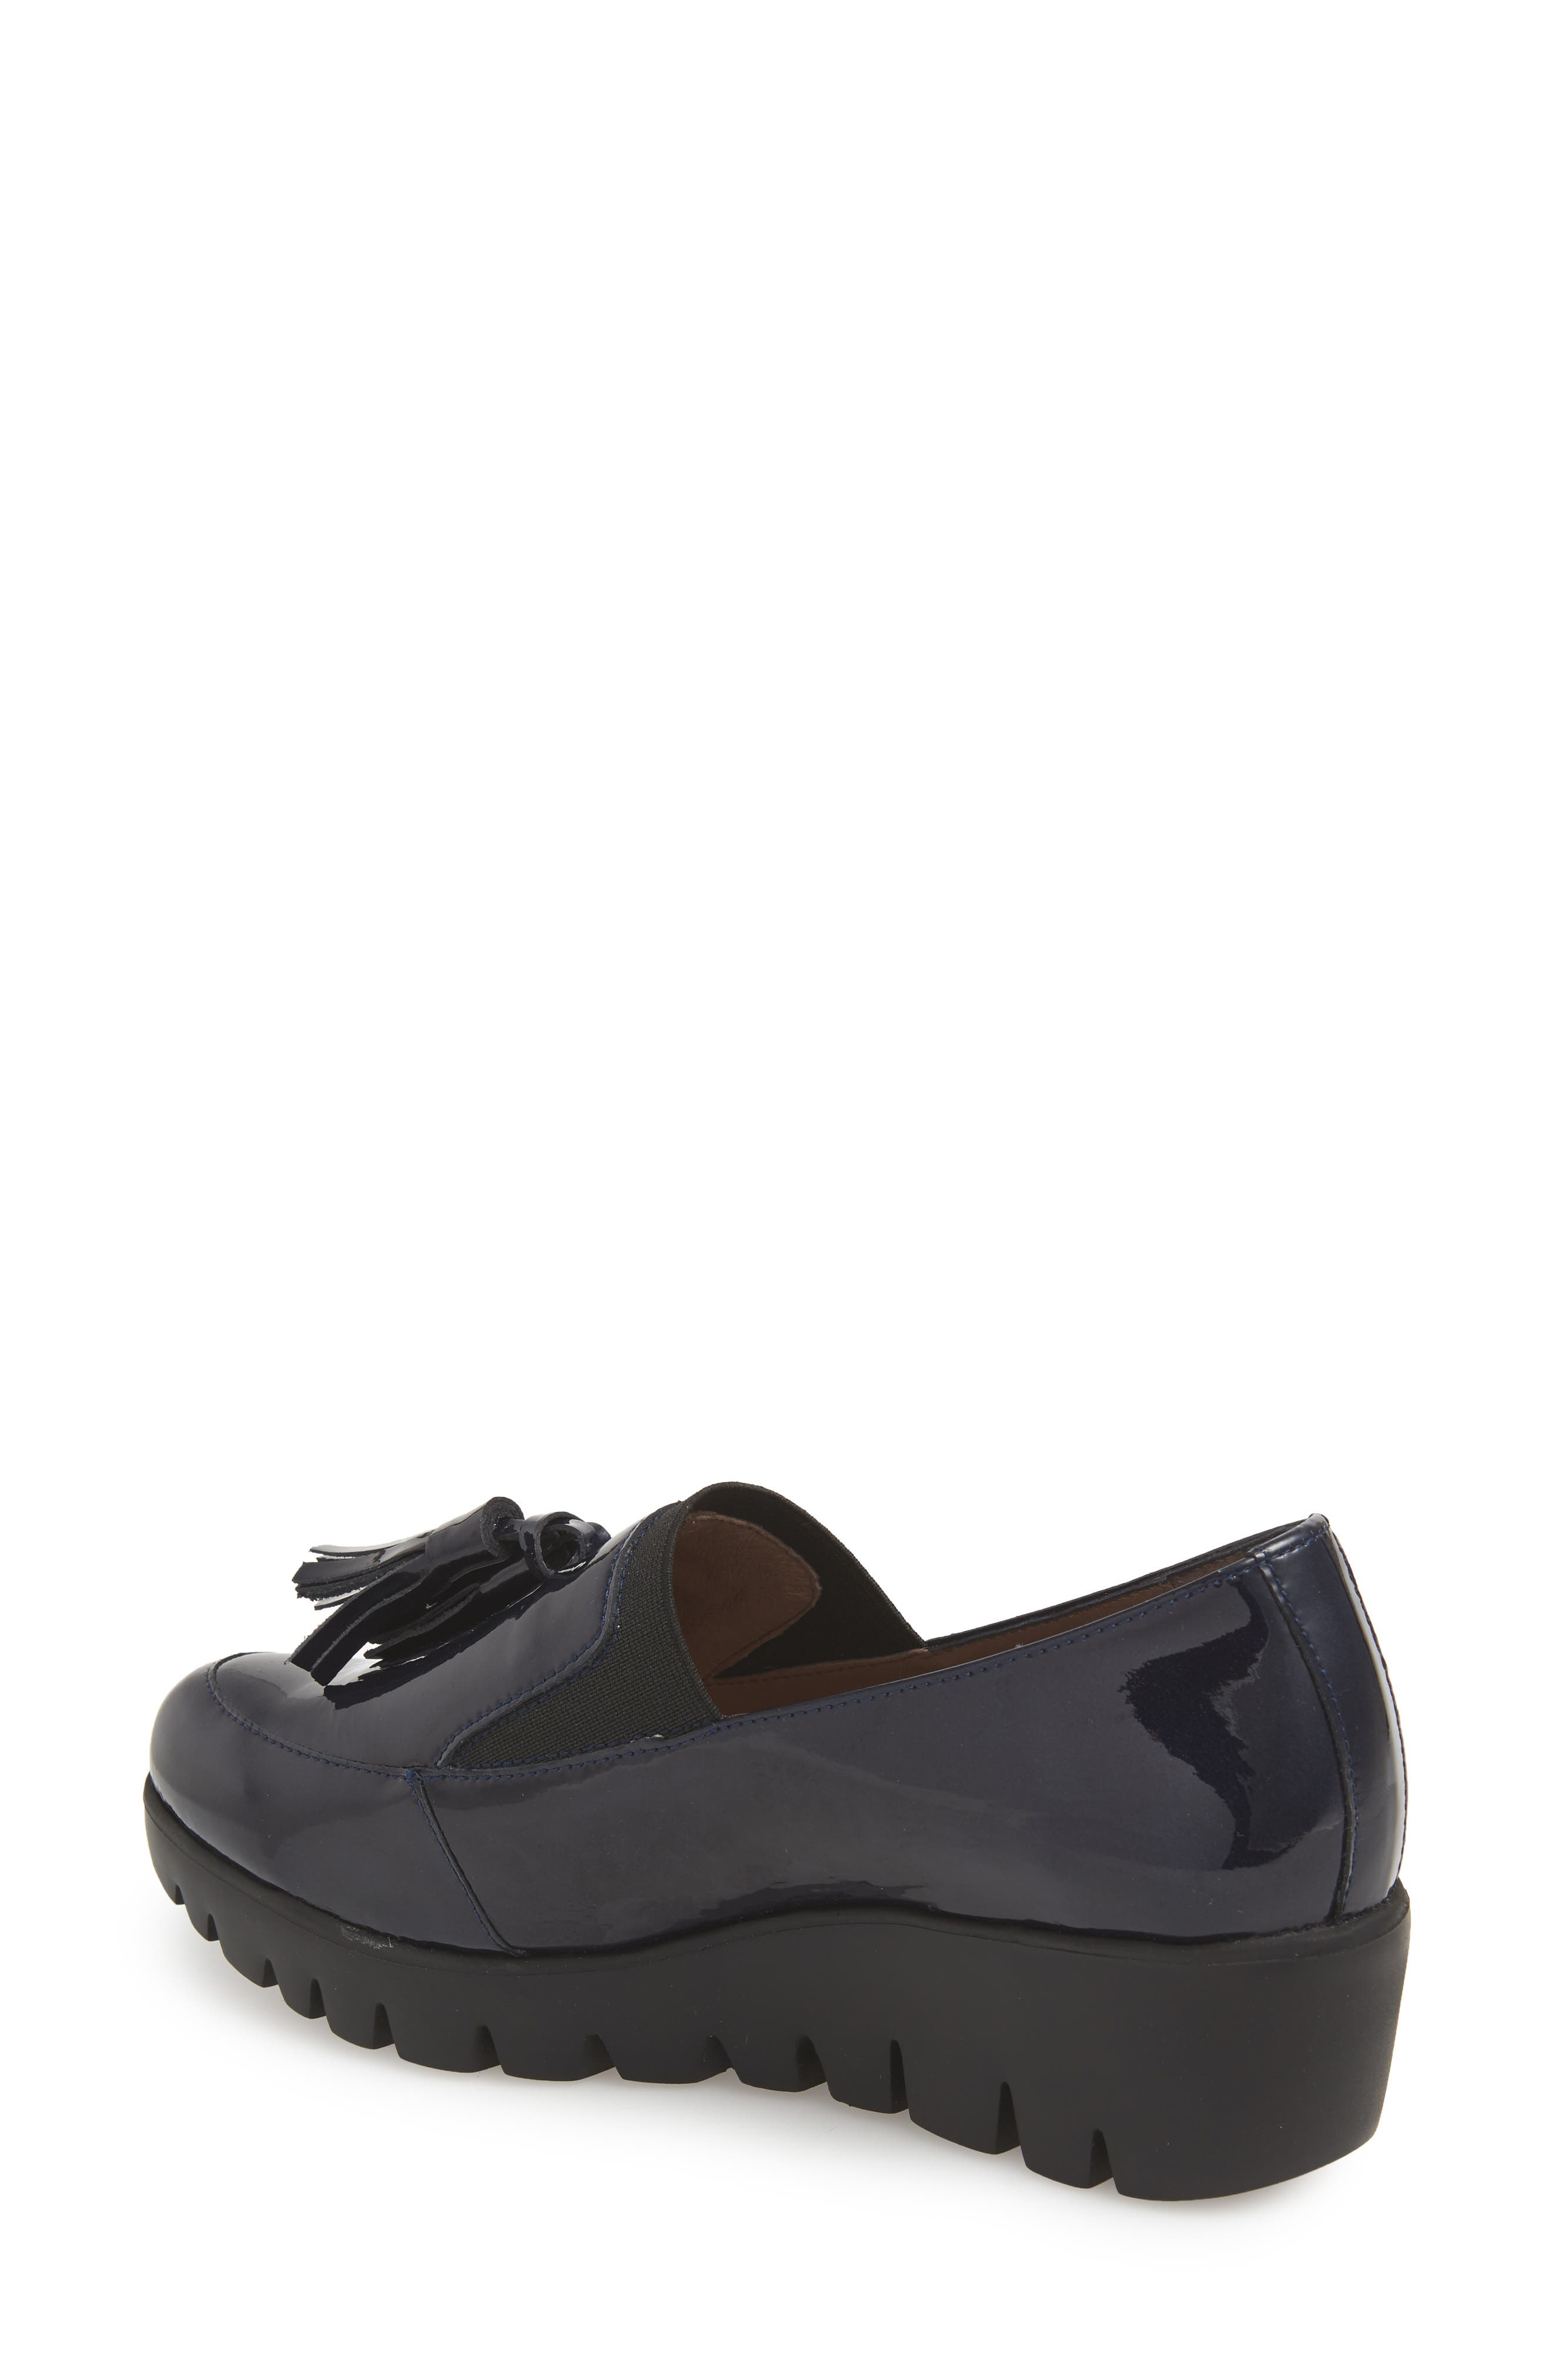 Womens Wonders Shoes Nordstrom D Island Slip On Mocasine Casual Black